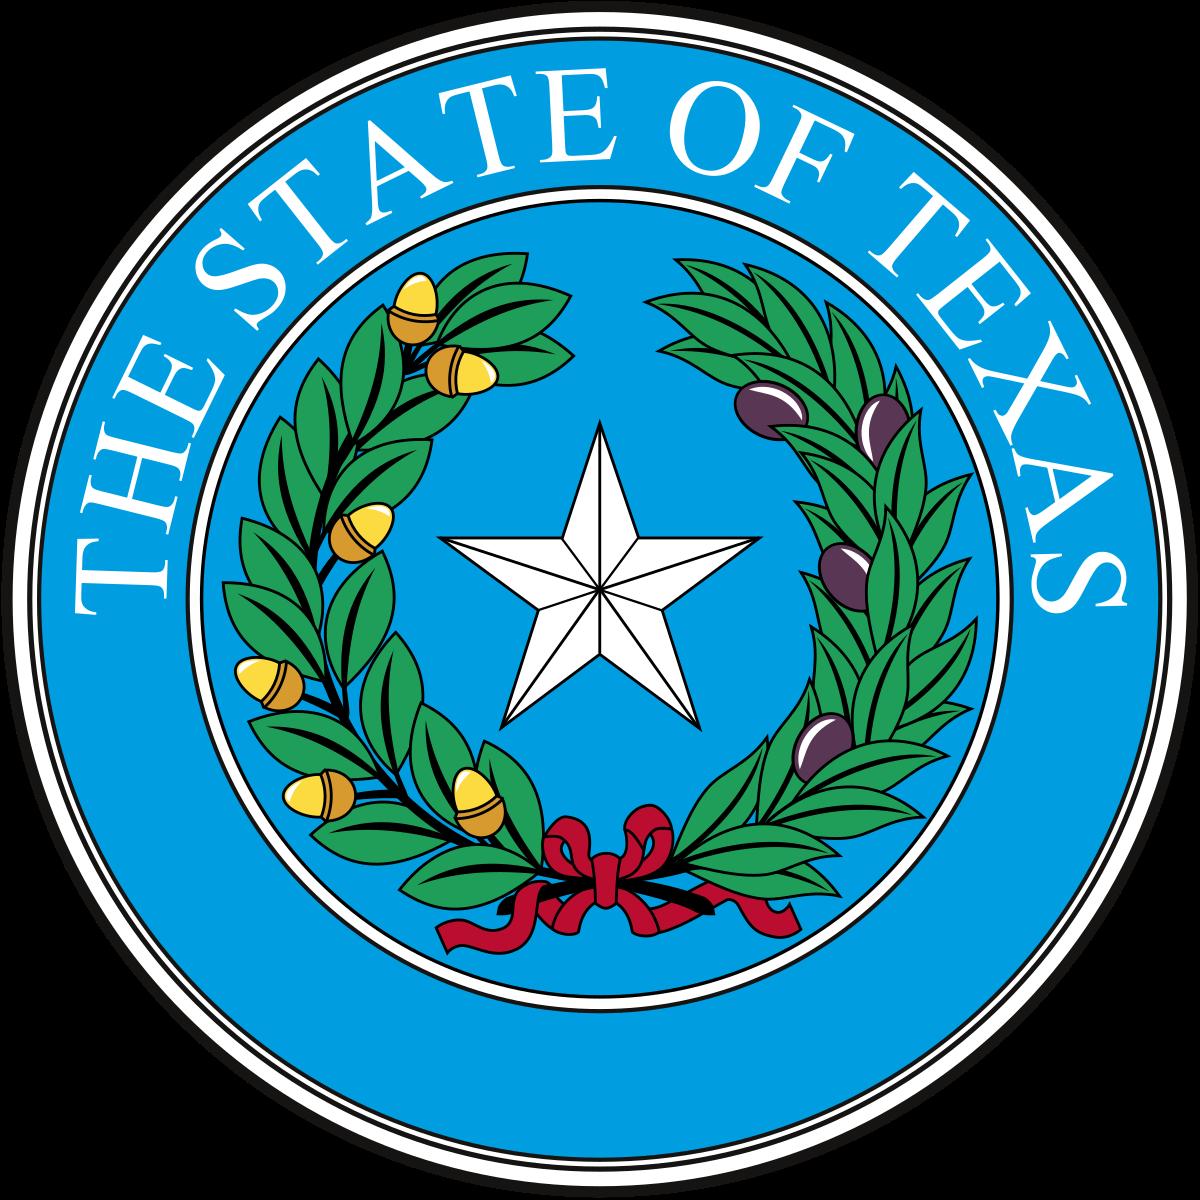 1200x1200 Seal Of Texas